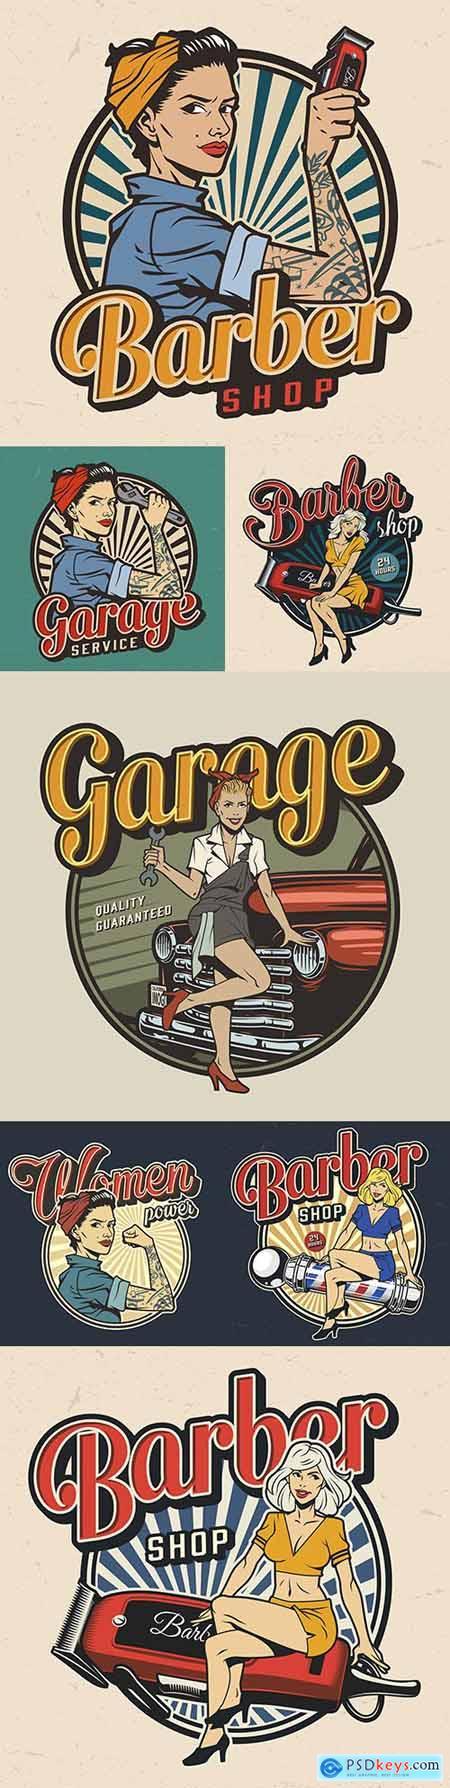 Vintage barbershop, garage service and car repair colorful label